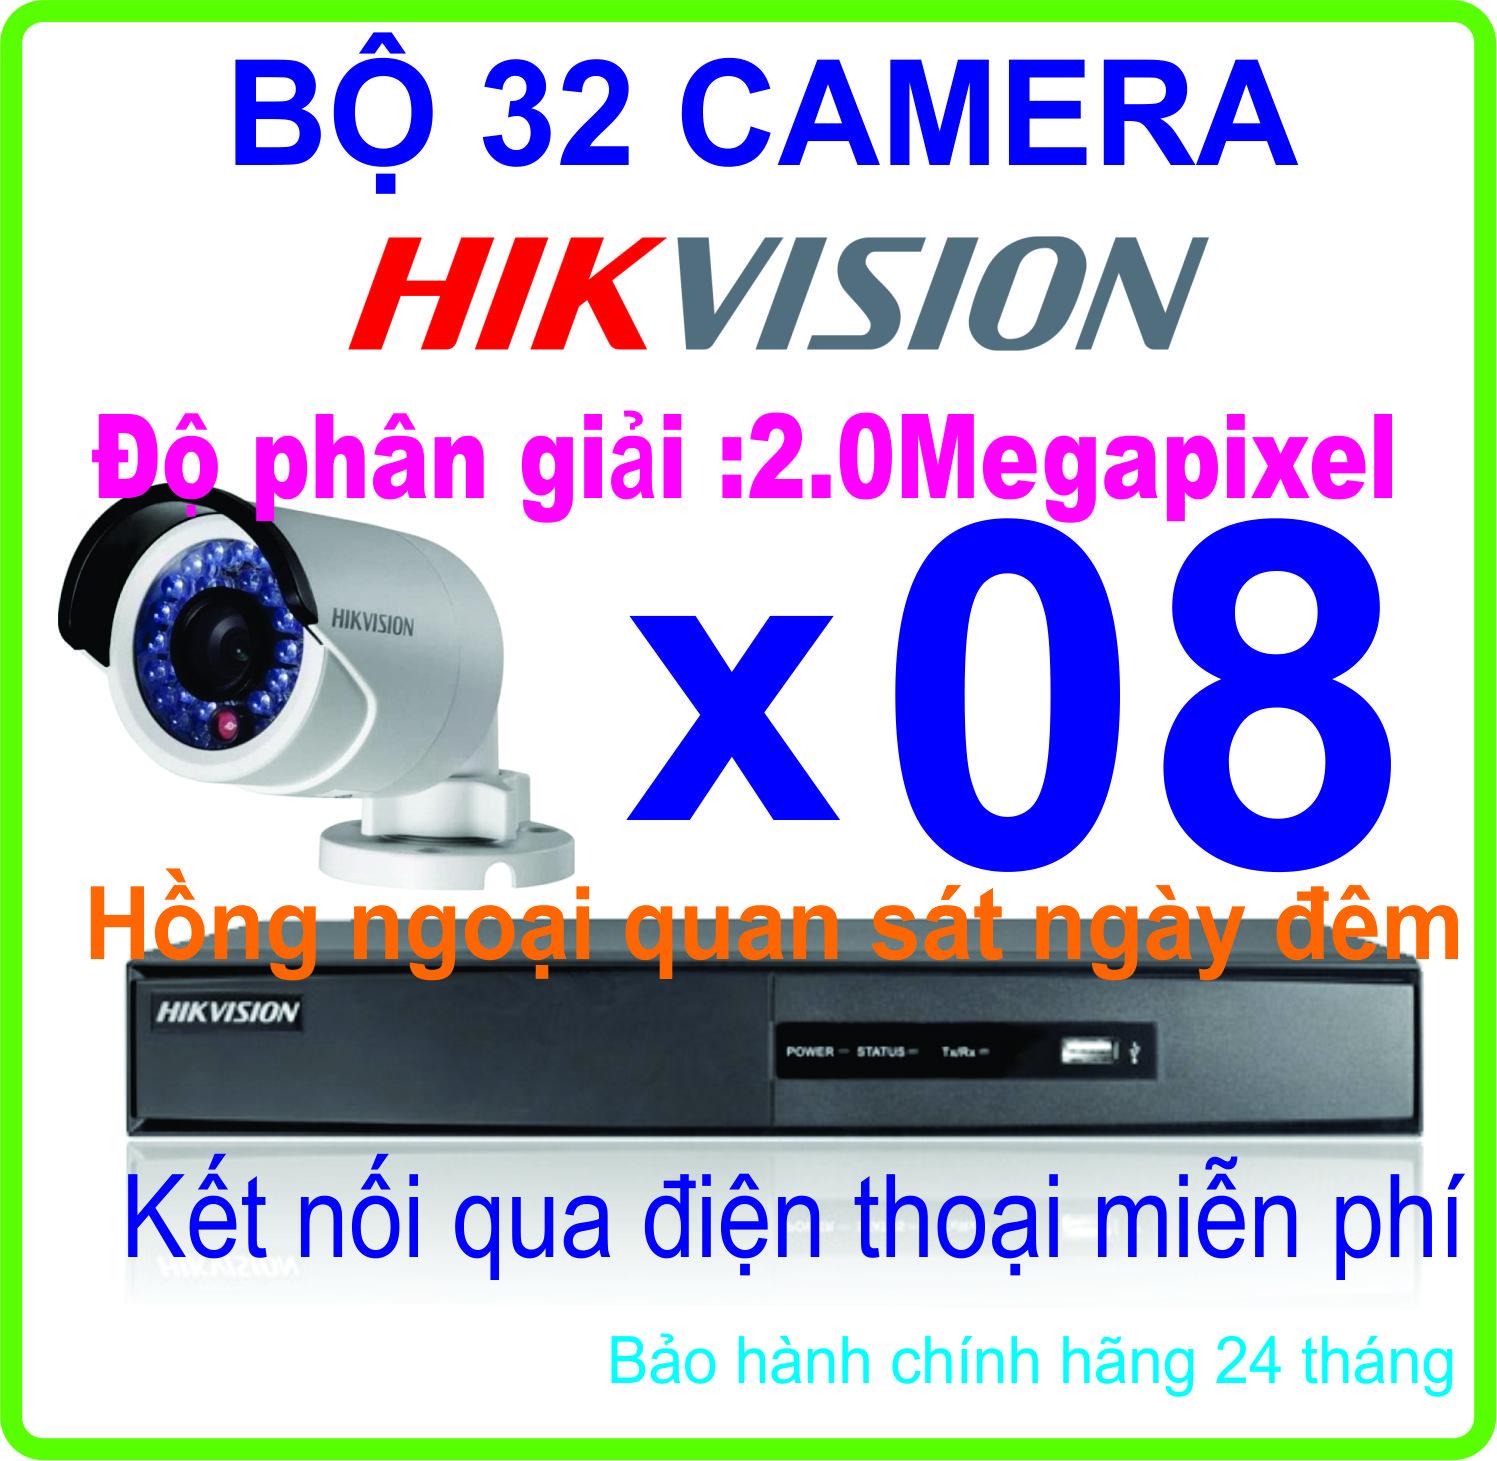 Hệ Thống Trọn Bộ 08 CAMERA HIKVISION 2.0Megapixel